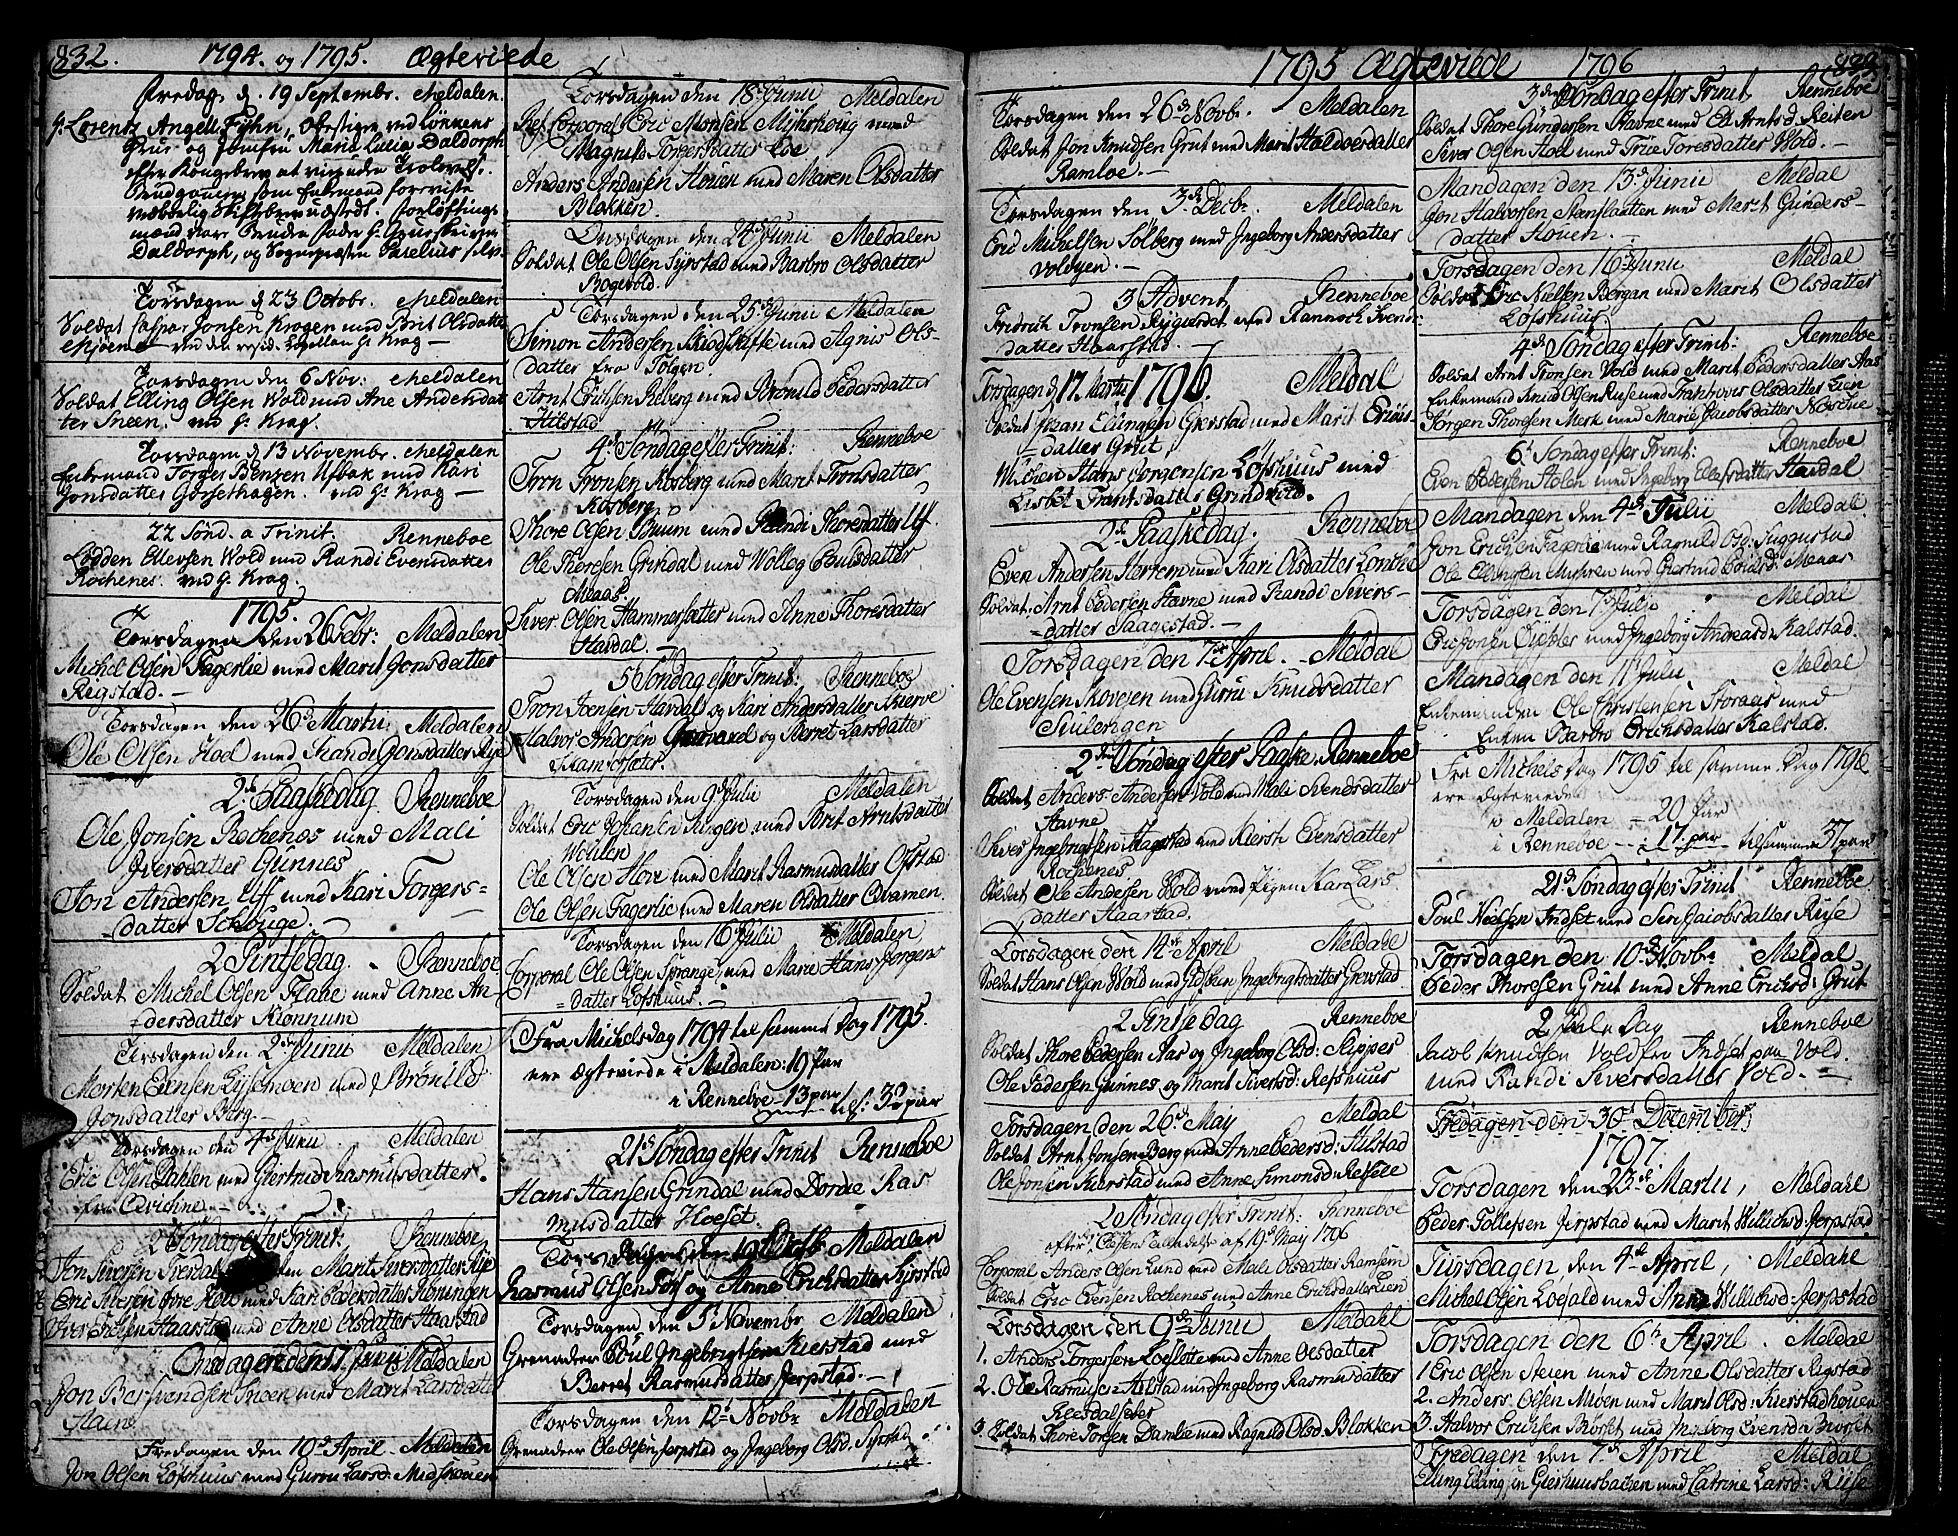 SAT, Ministerialprotokoller, klokkerbøker og fødselsregistre - Sør-Trøndelag, 672/L0852: Parish register (official) no. 672A05, 1776-1815, p. 832-833